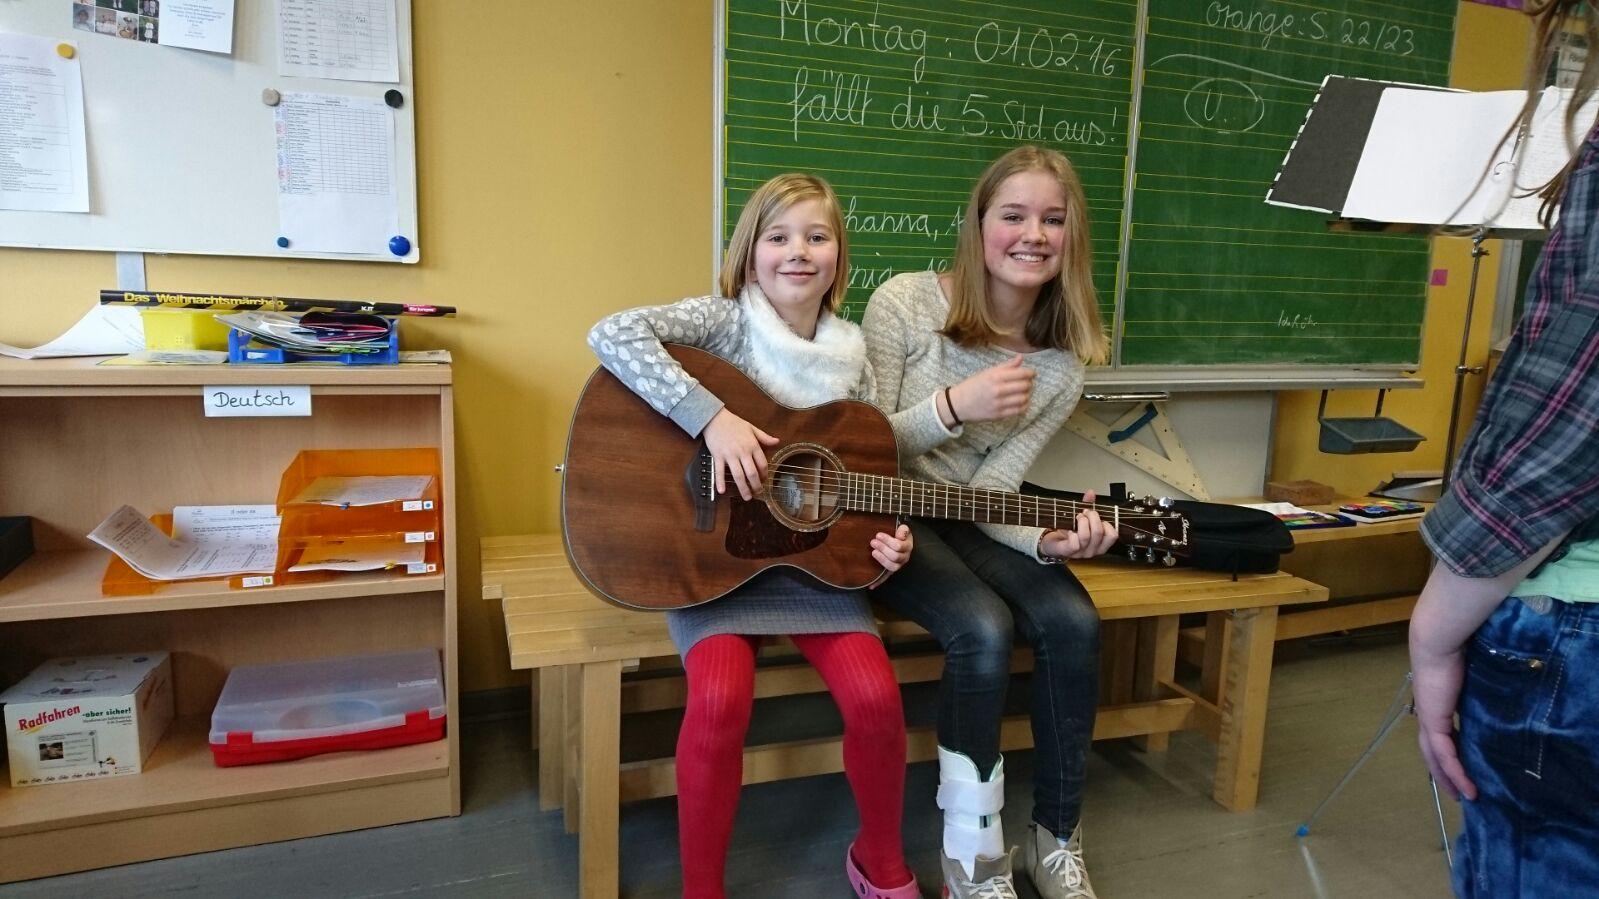 Klasse 4 macht Musik mit E- und Akustik Gitarre : Wichlinghofer Grundschule